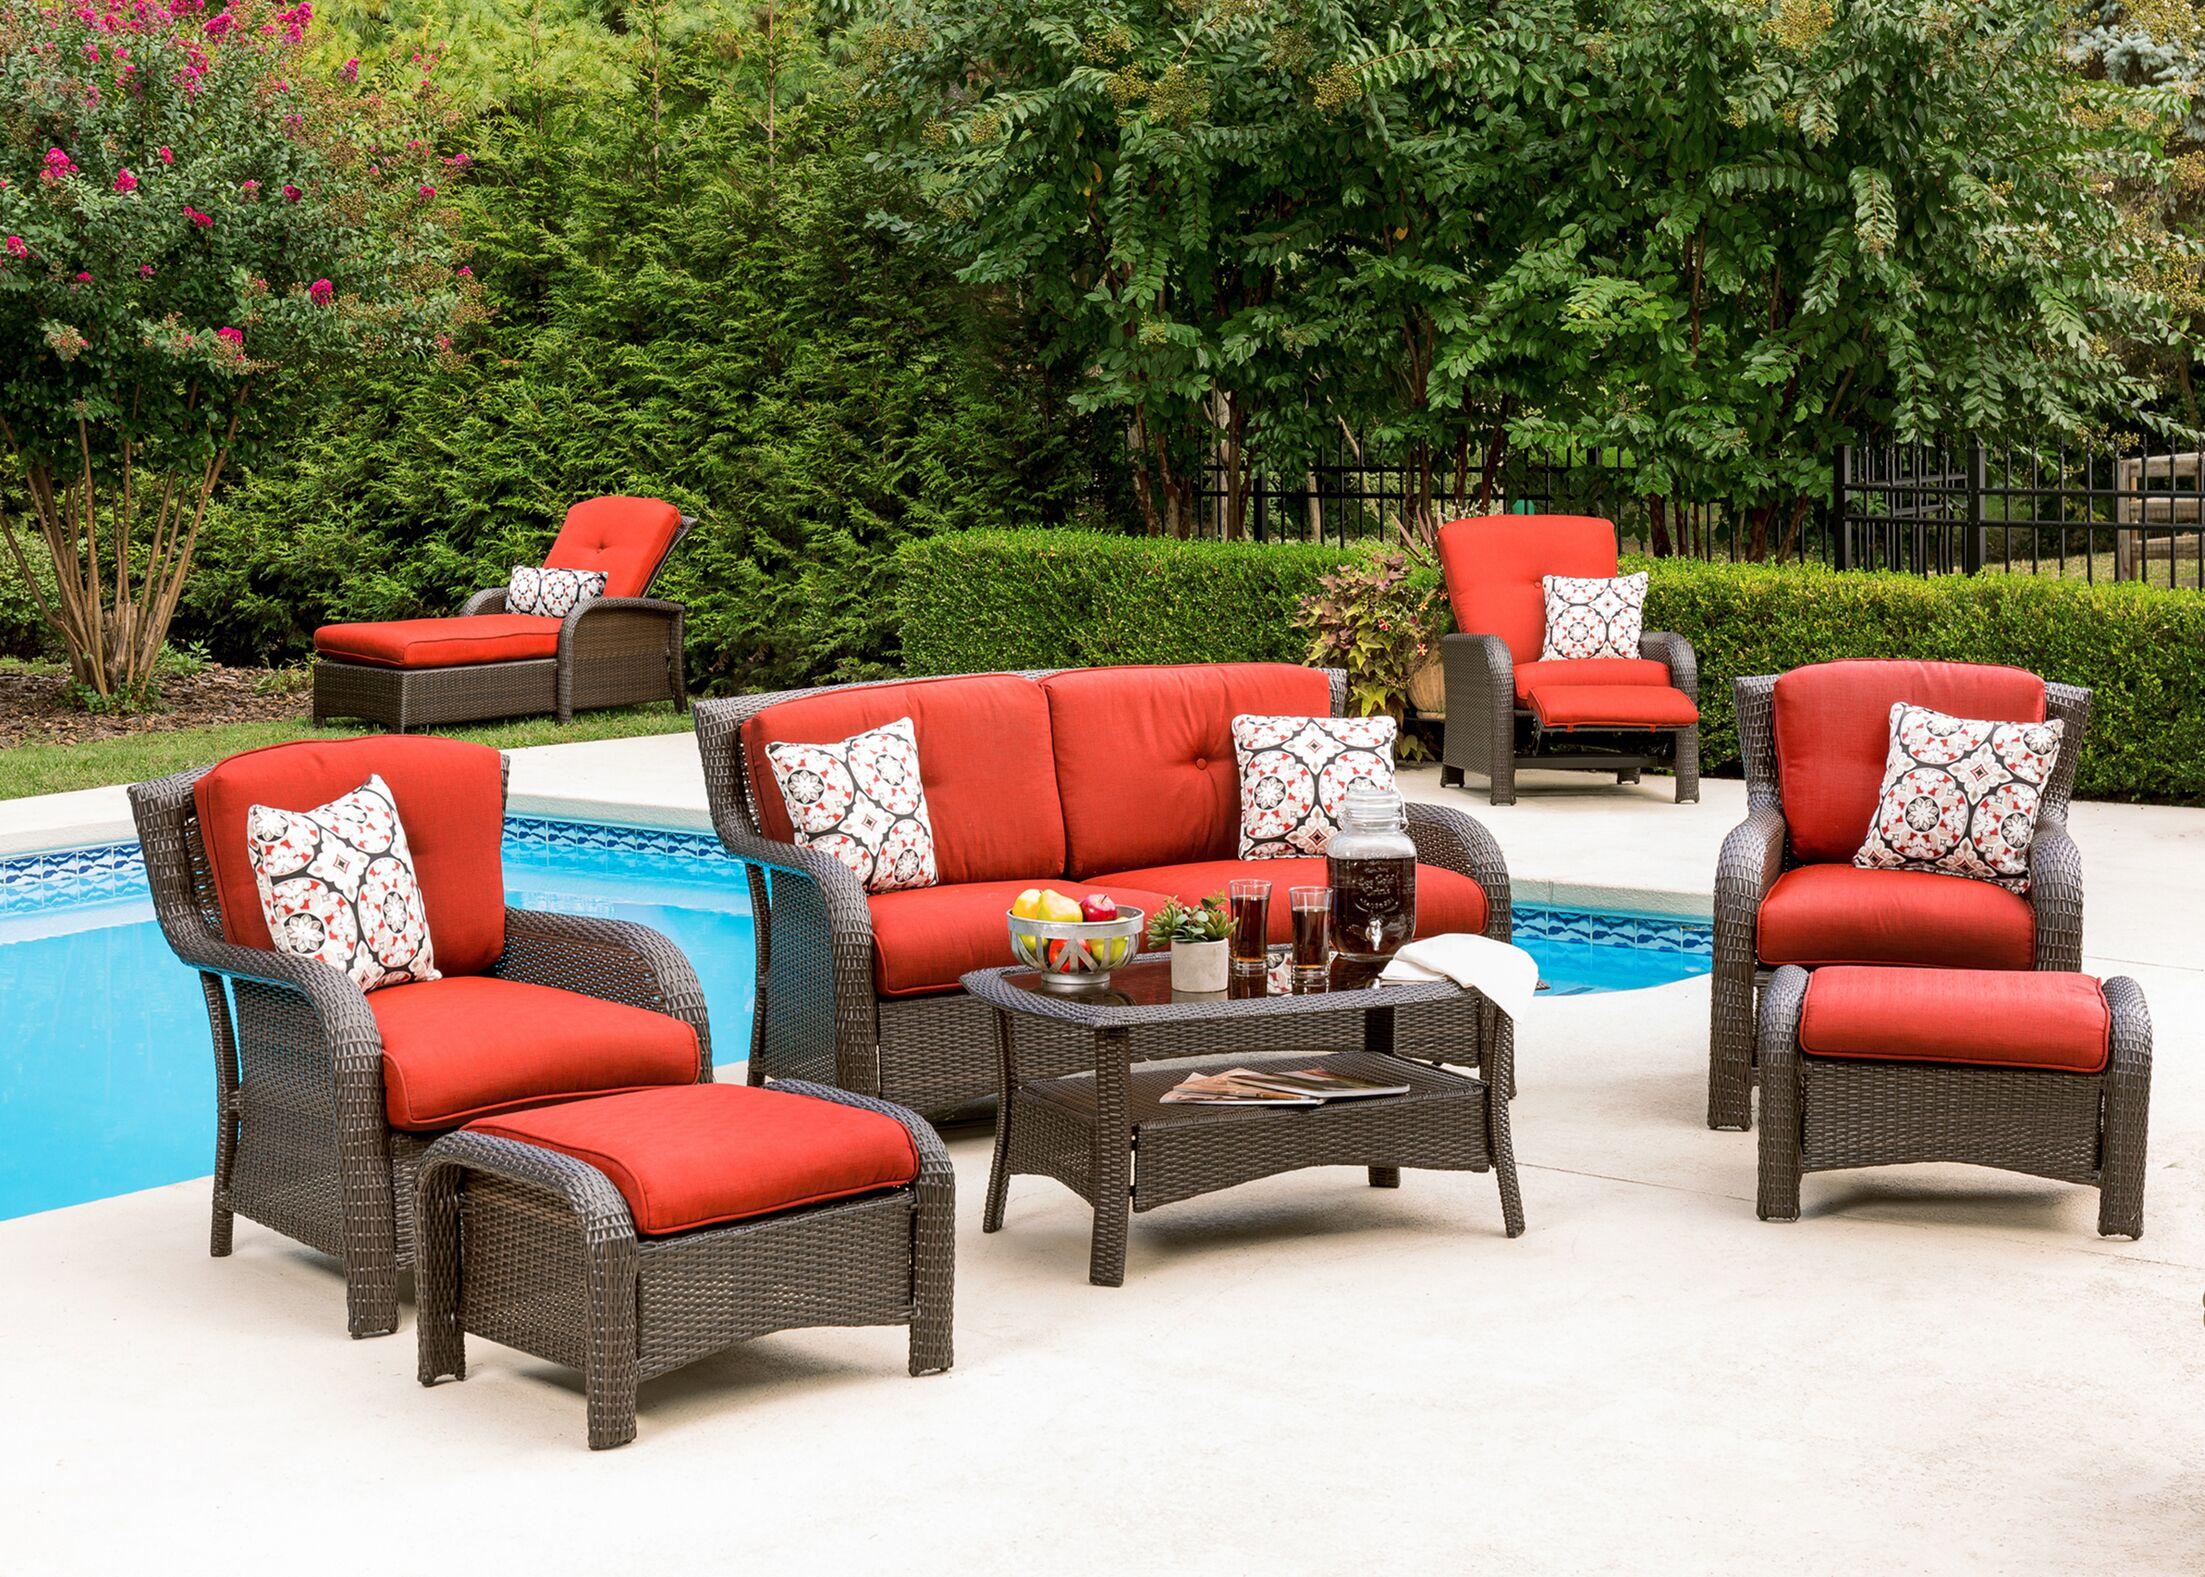 Billington 6 Piece Sofa Set with Cushions Fabric: Crimson Red